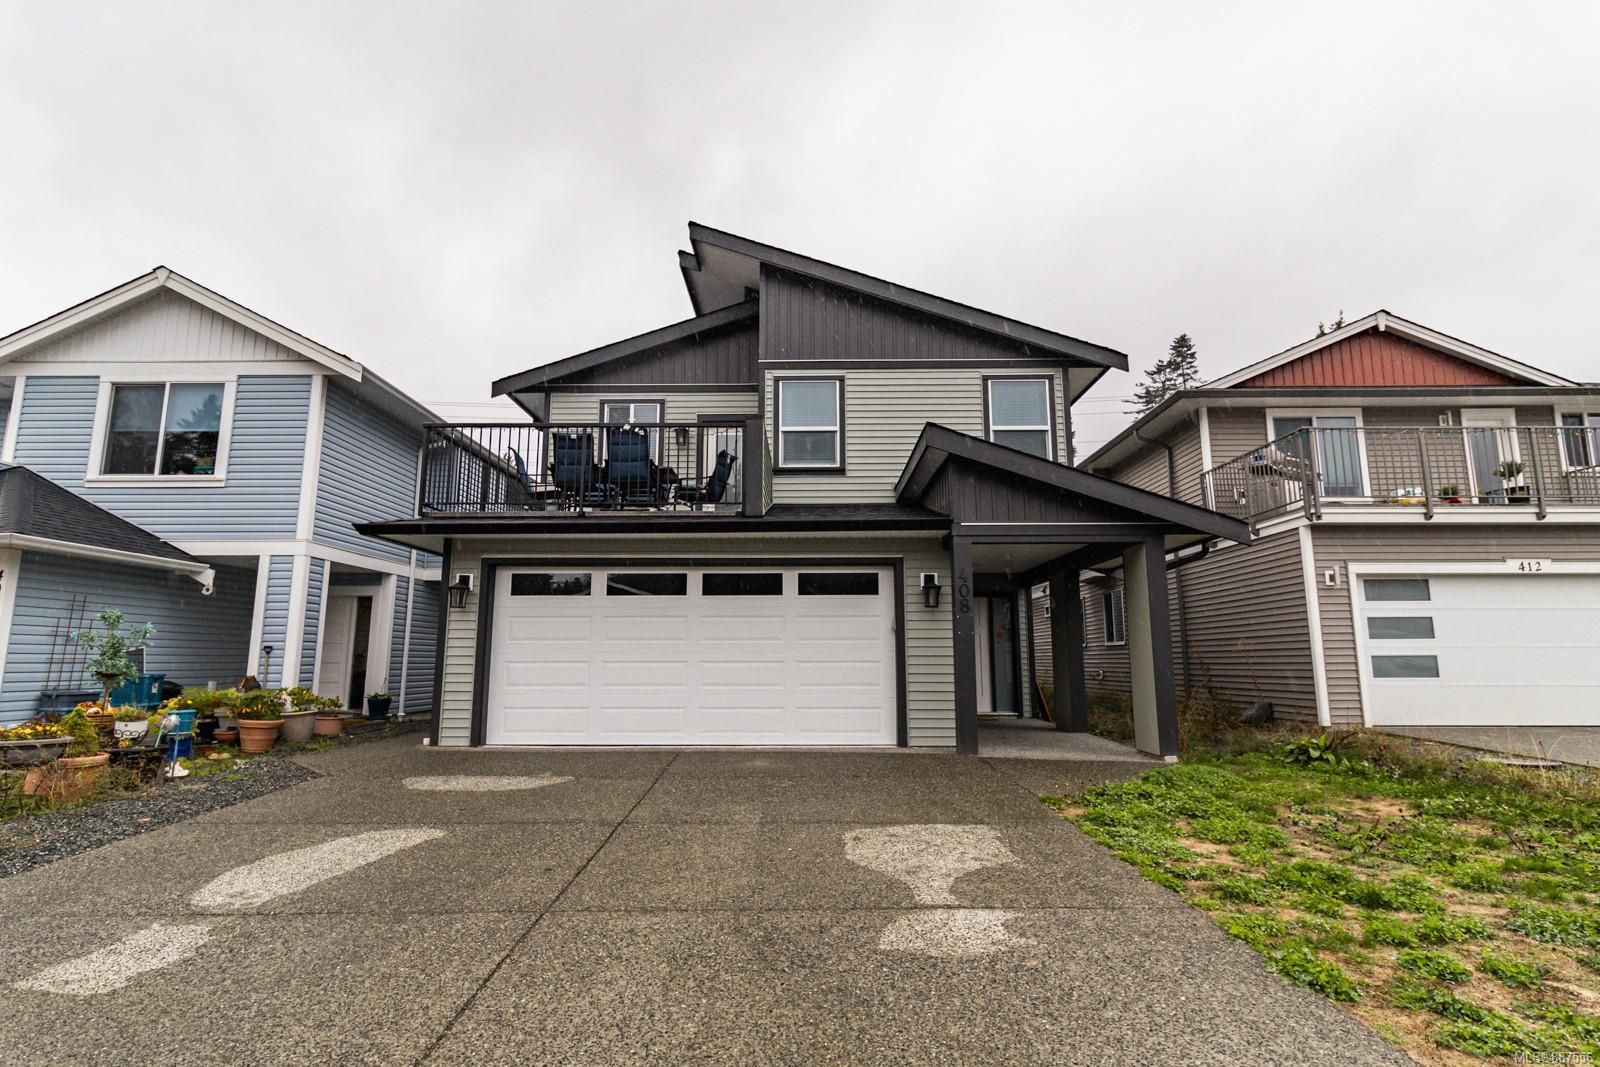 Main Photo: 408 10th St in Nanaimo: Na South Nanaimo House for sale : MLS®# 887556